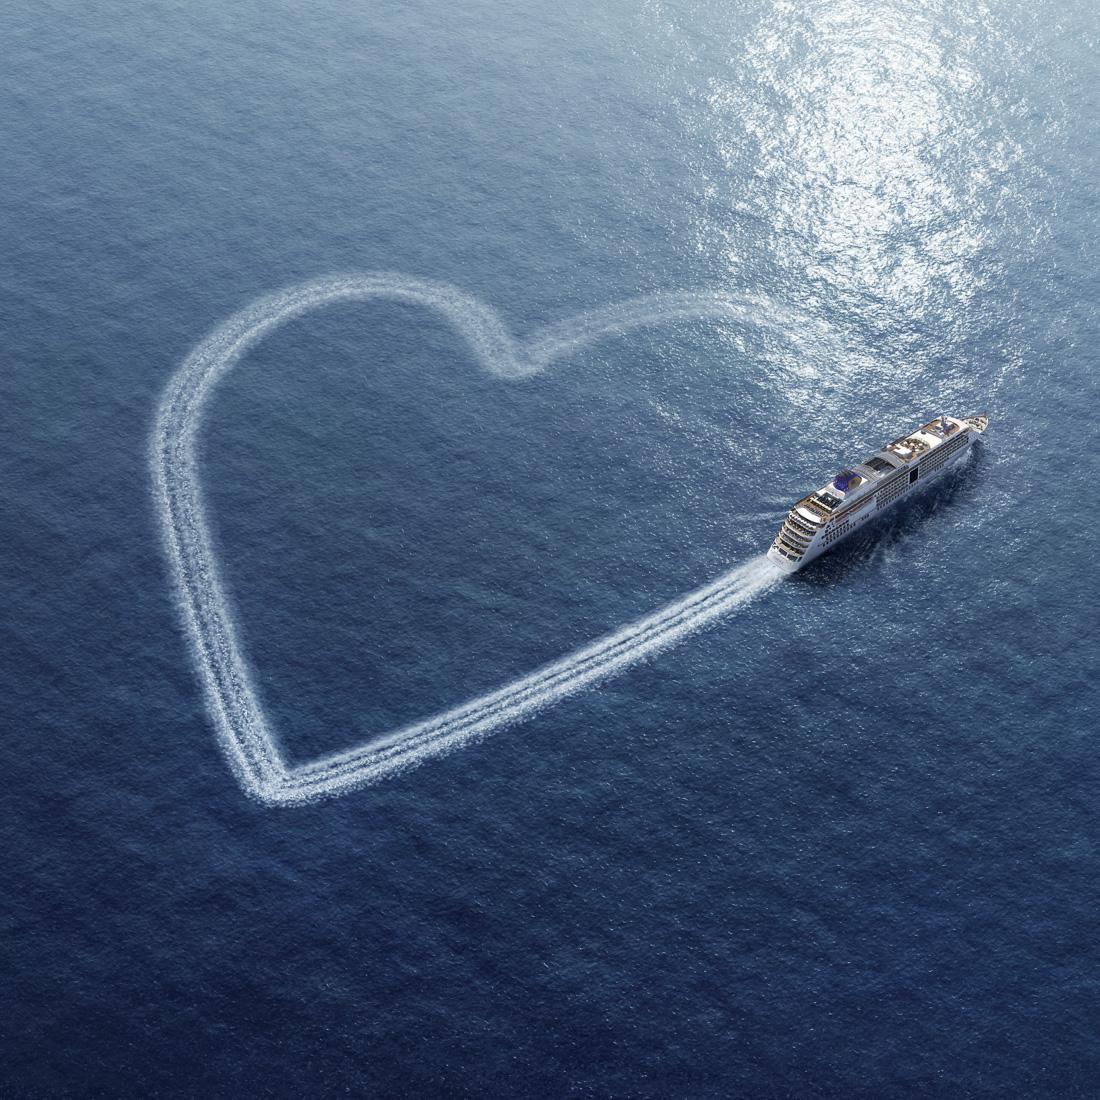 Jaahaahaaaa, ich will… Heiraten an Bord der EUROPA 2